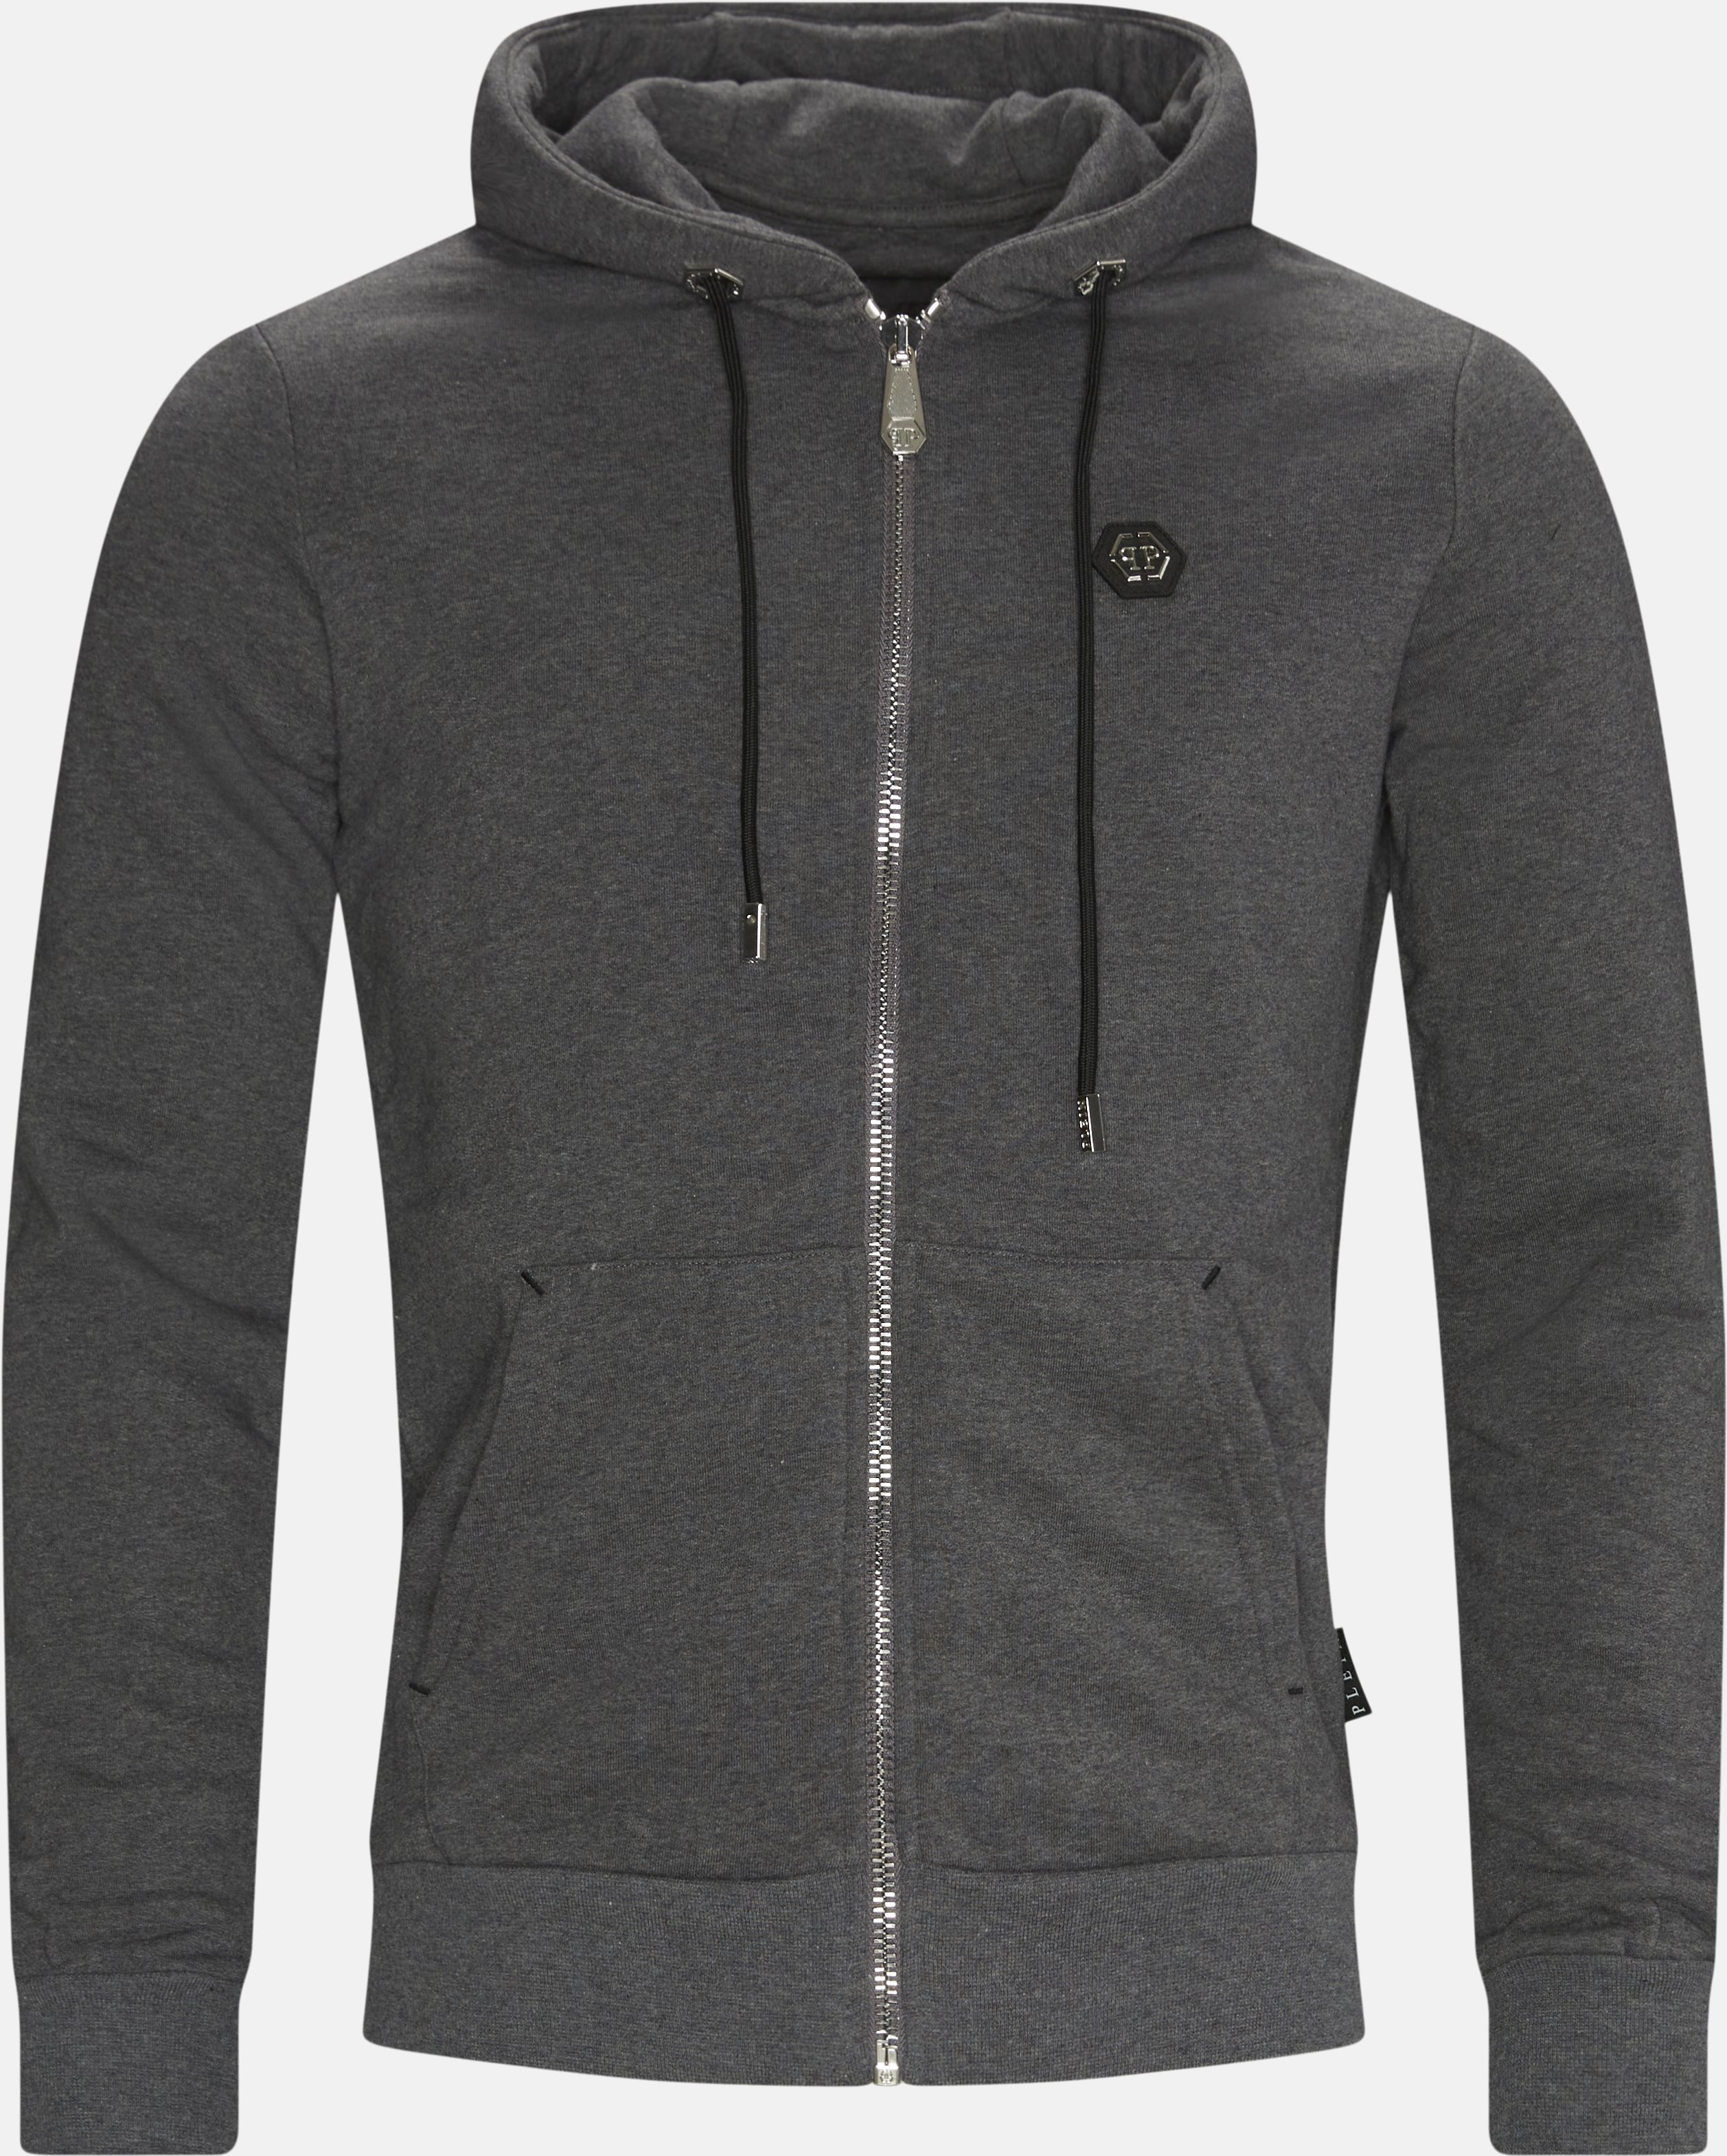 Sweatshirts - Loose fit - Grey